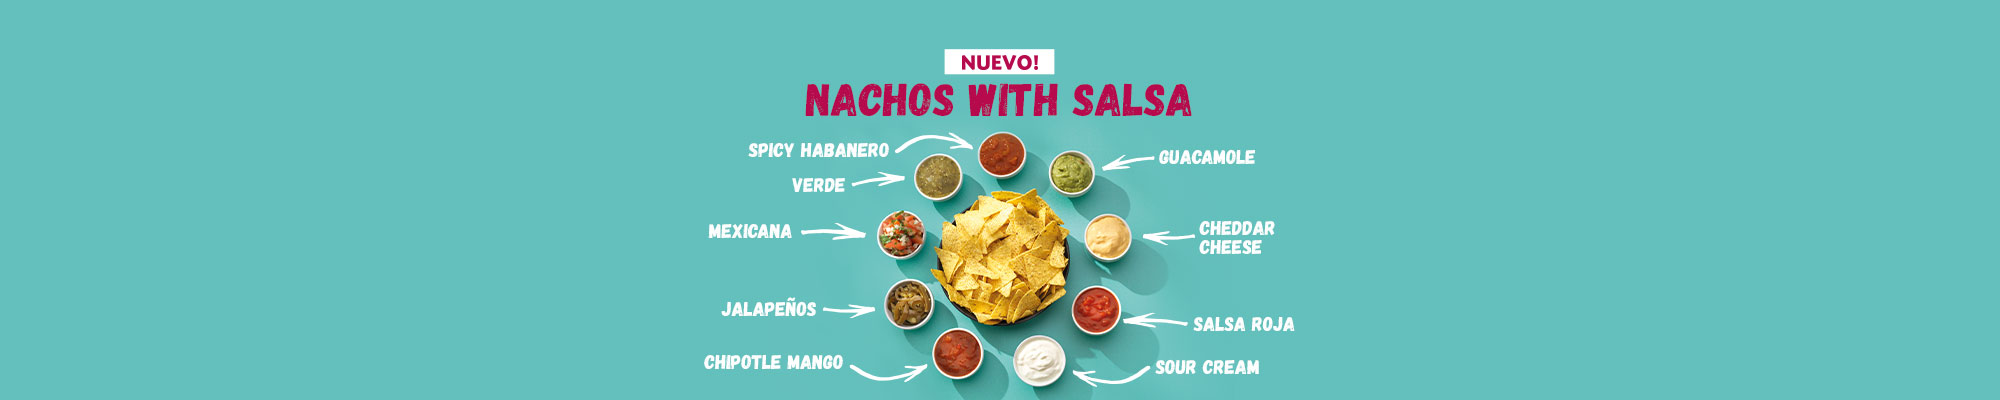 Nieuw bij Taco Mundo: Nachos with Salsas!